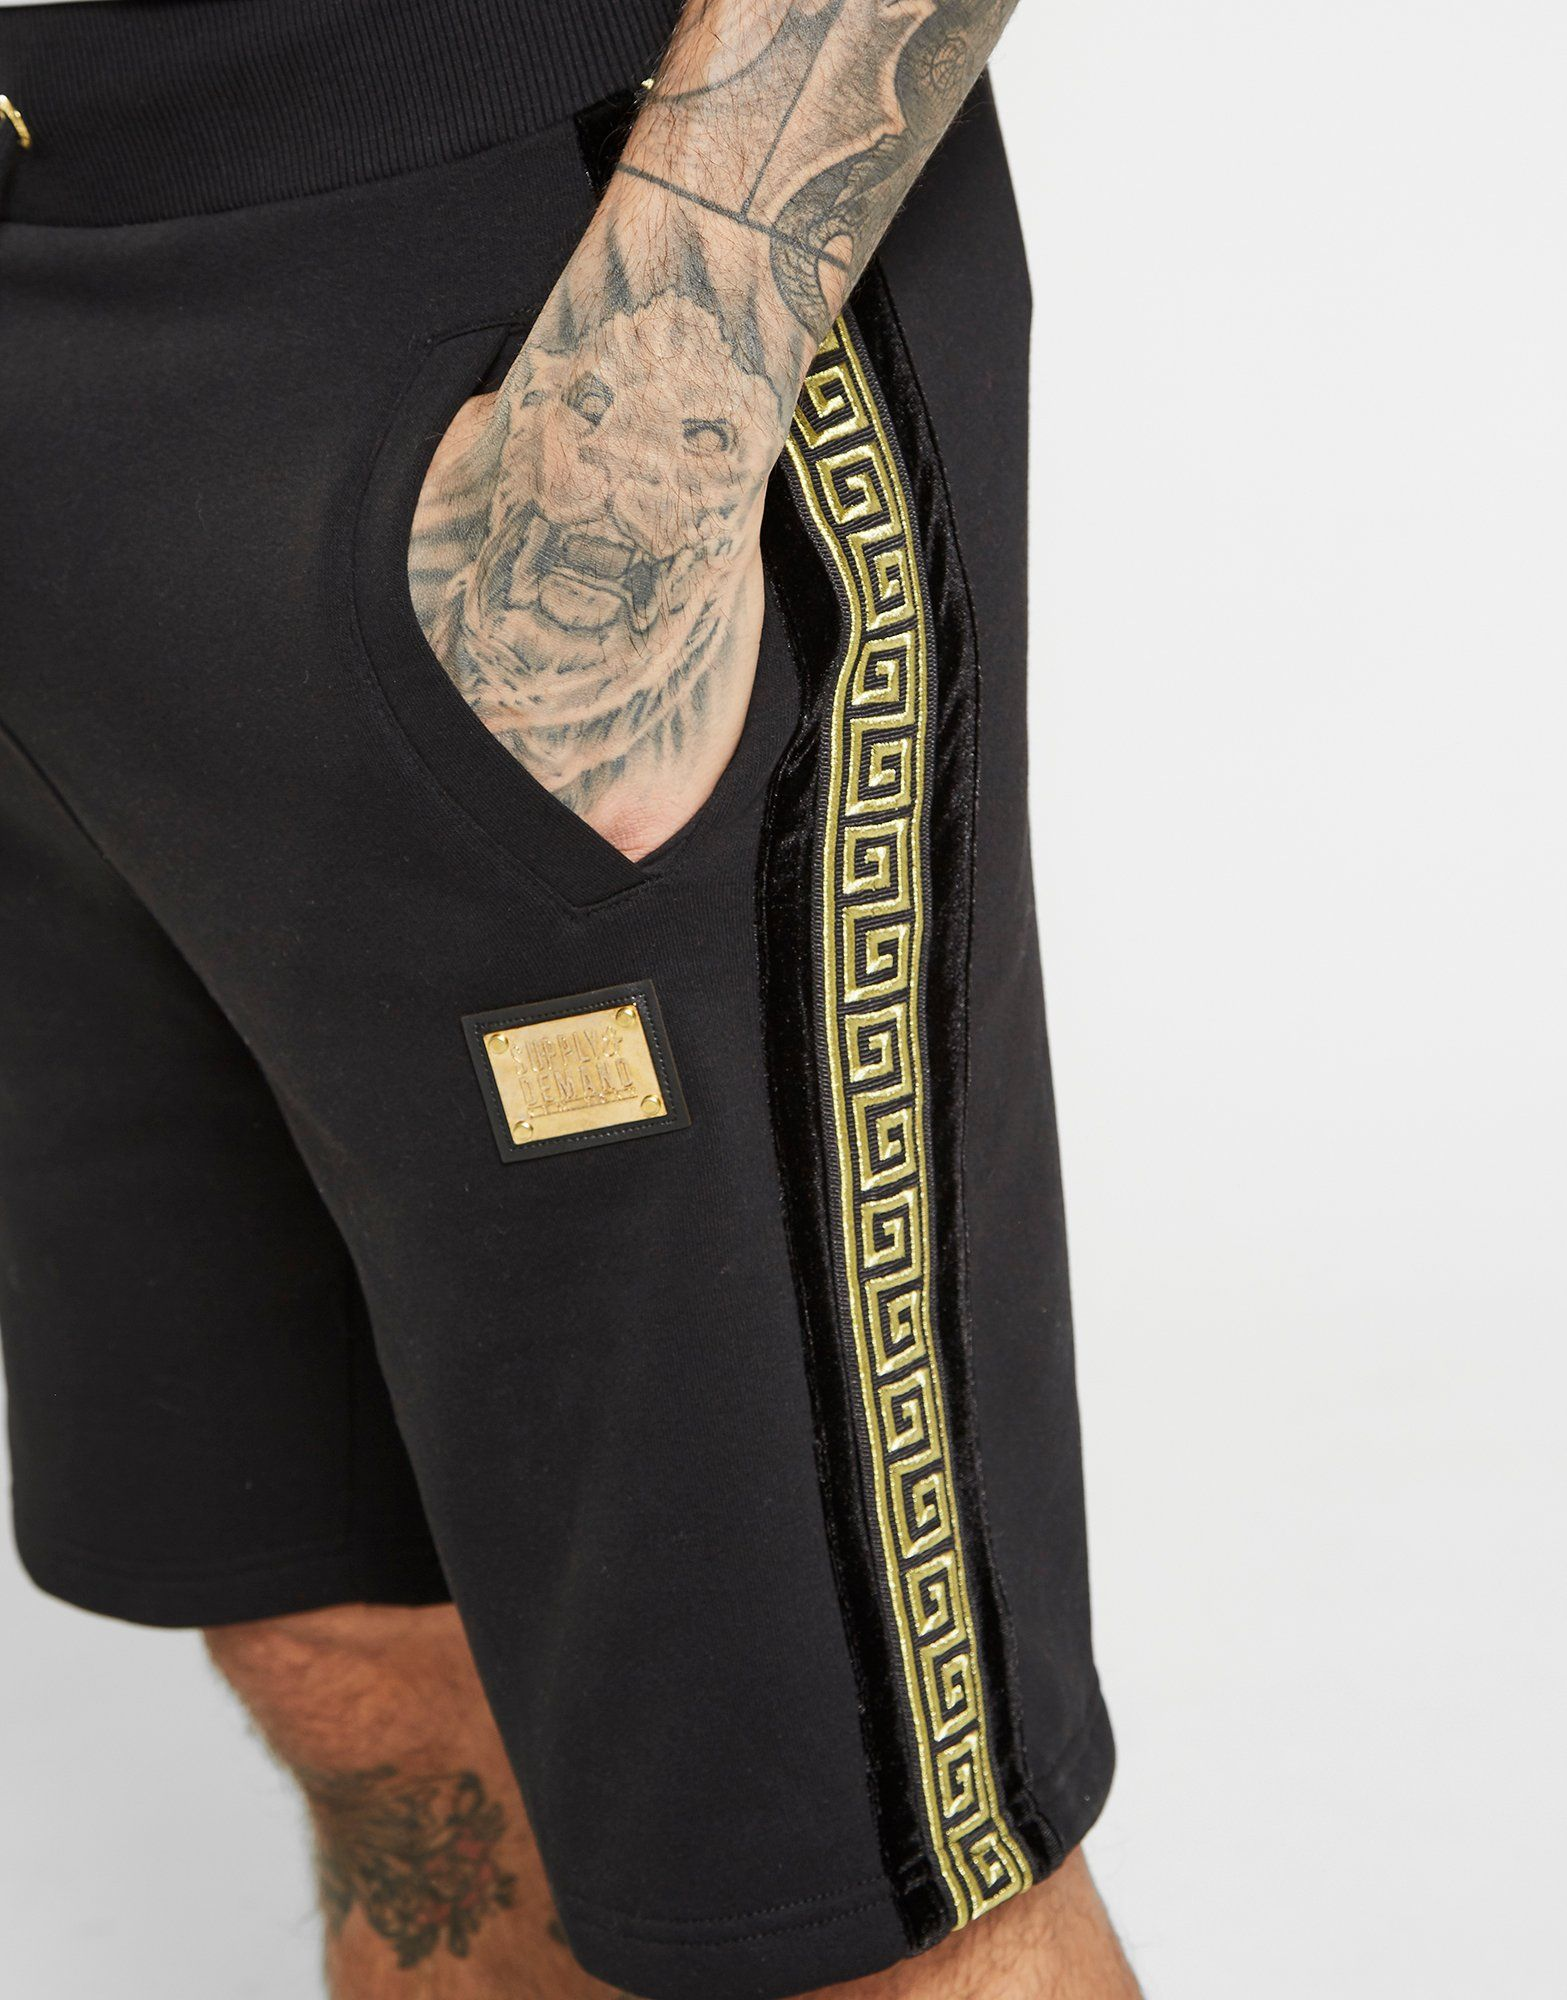 Supply & Demand Trophy Shorts